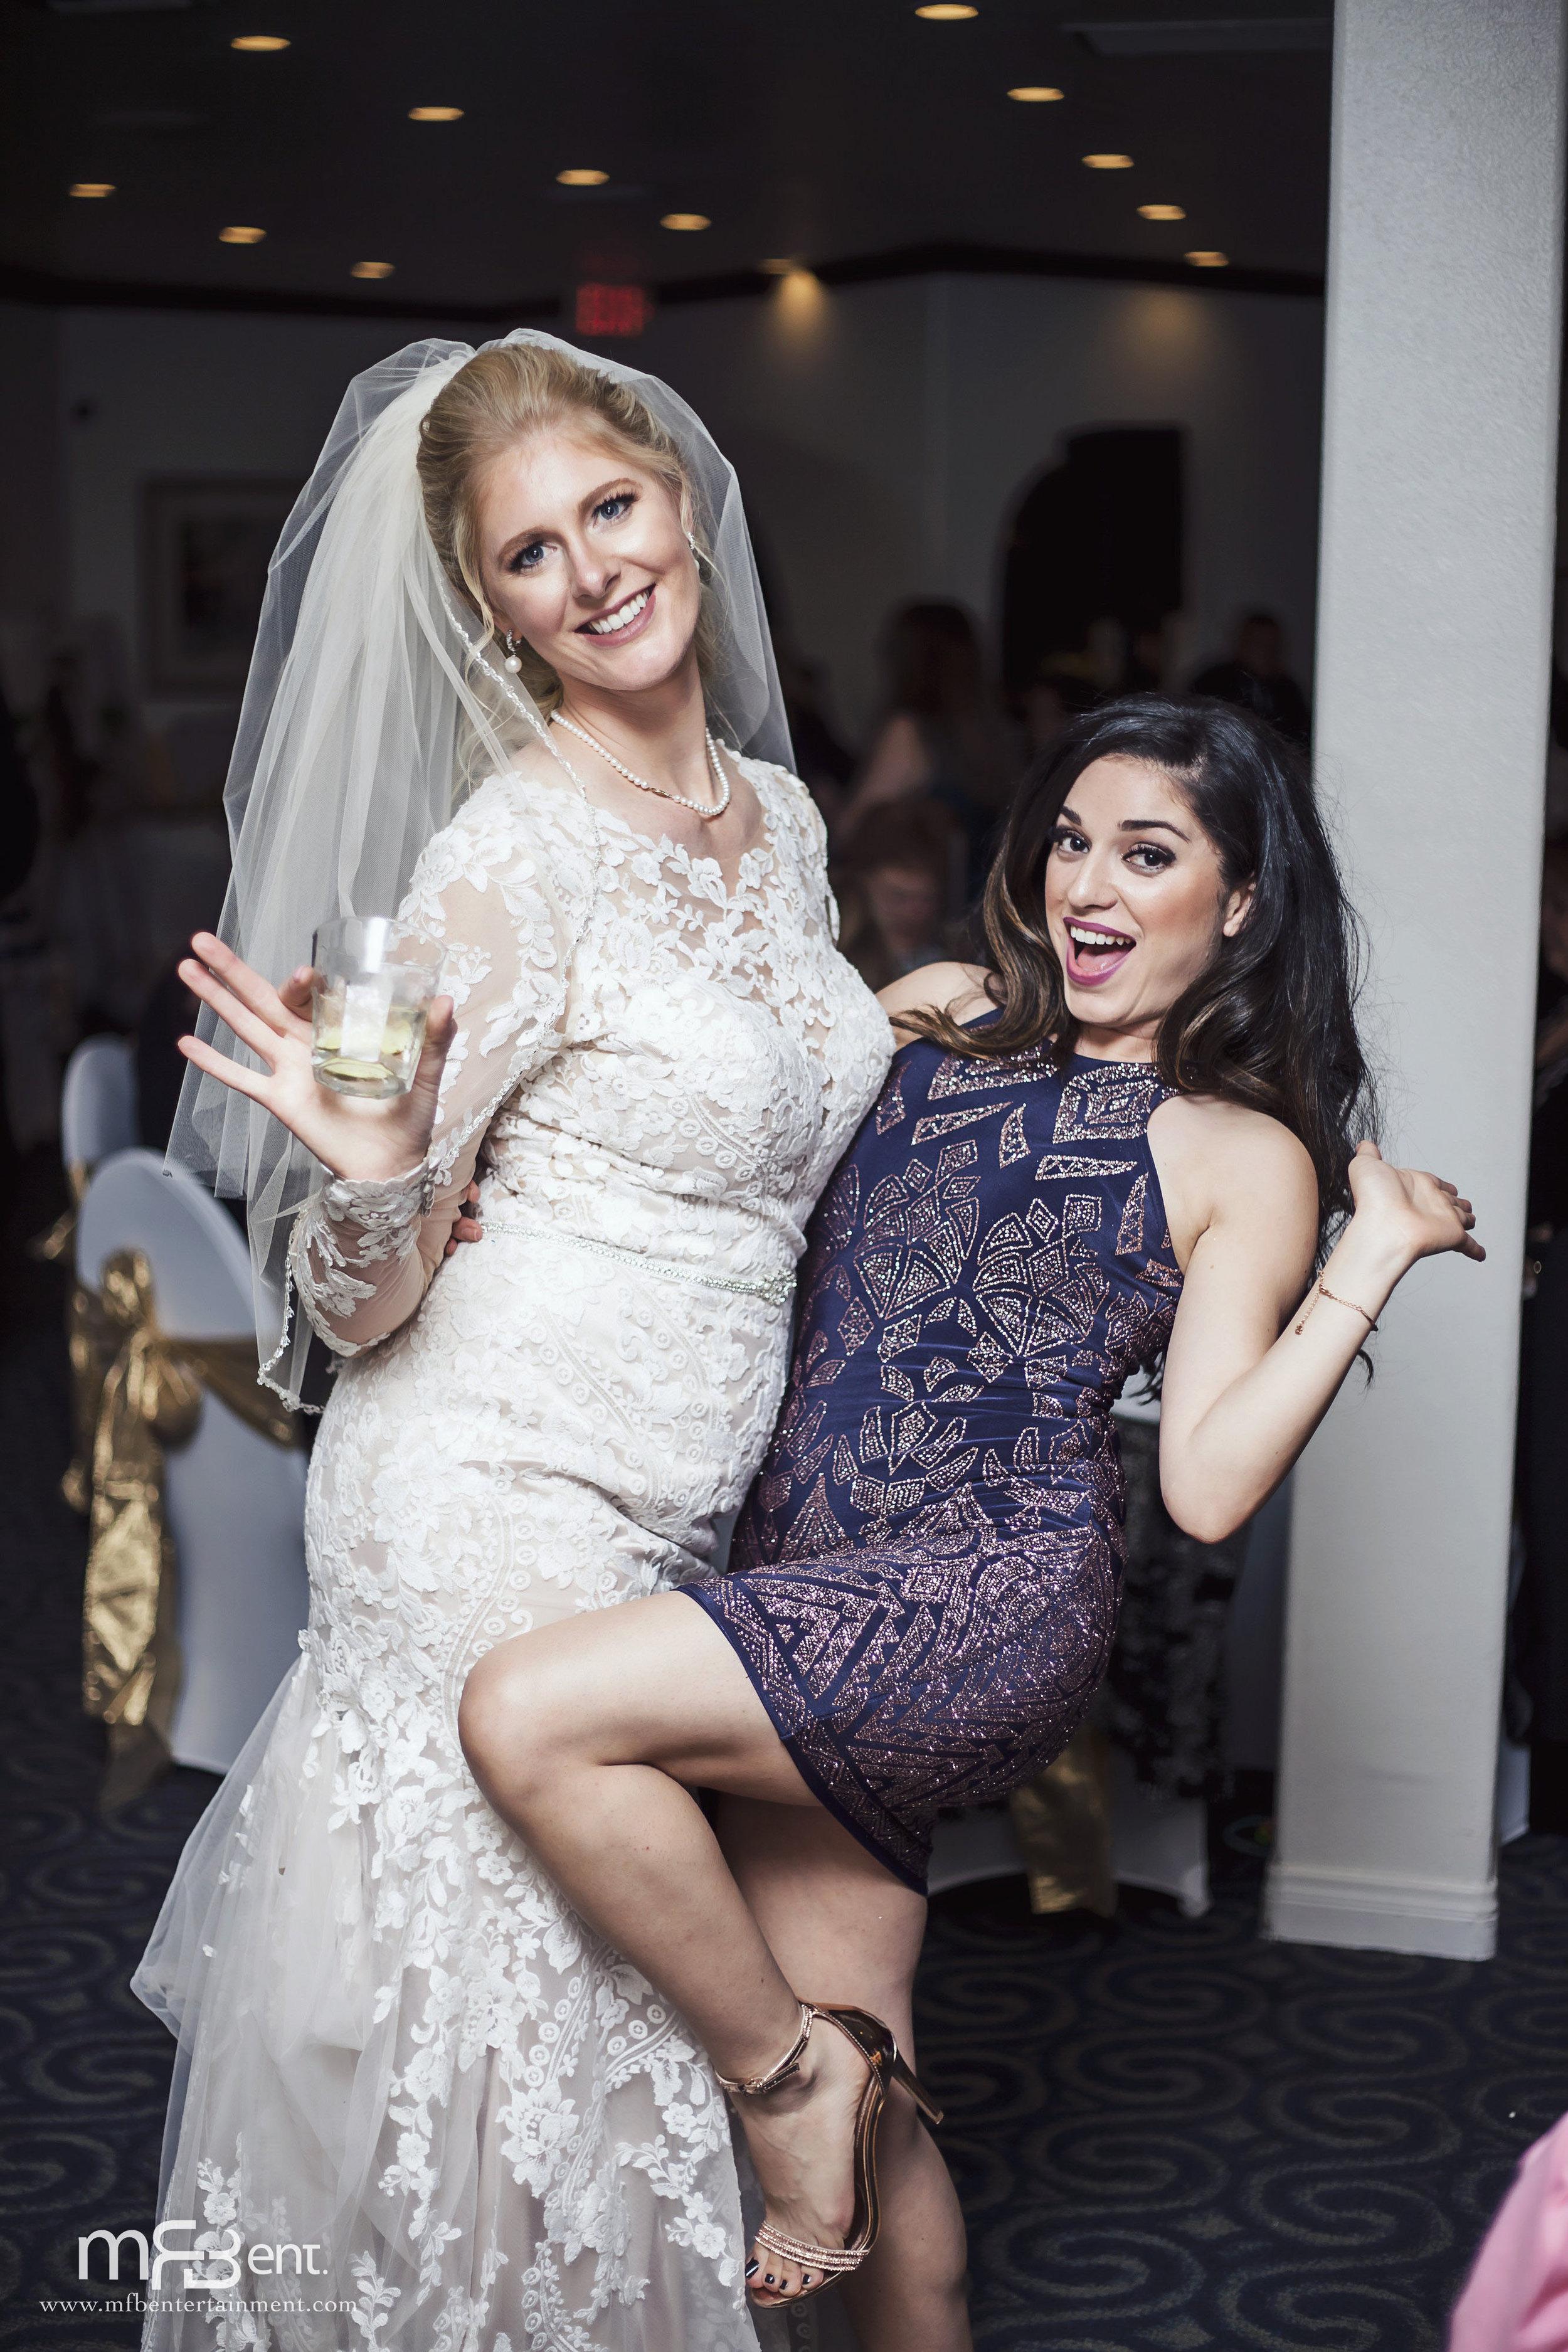 PIOTR CHELSEA WEDDING-RECEPTION-0056 L.jpg